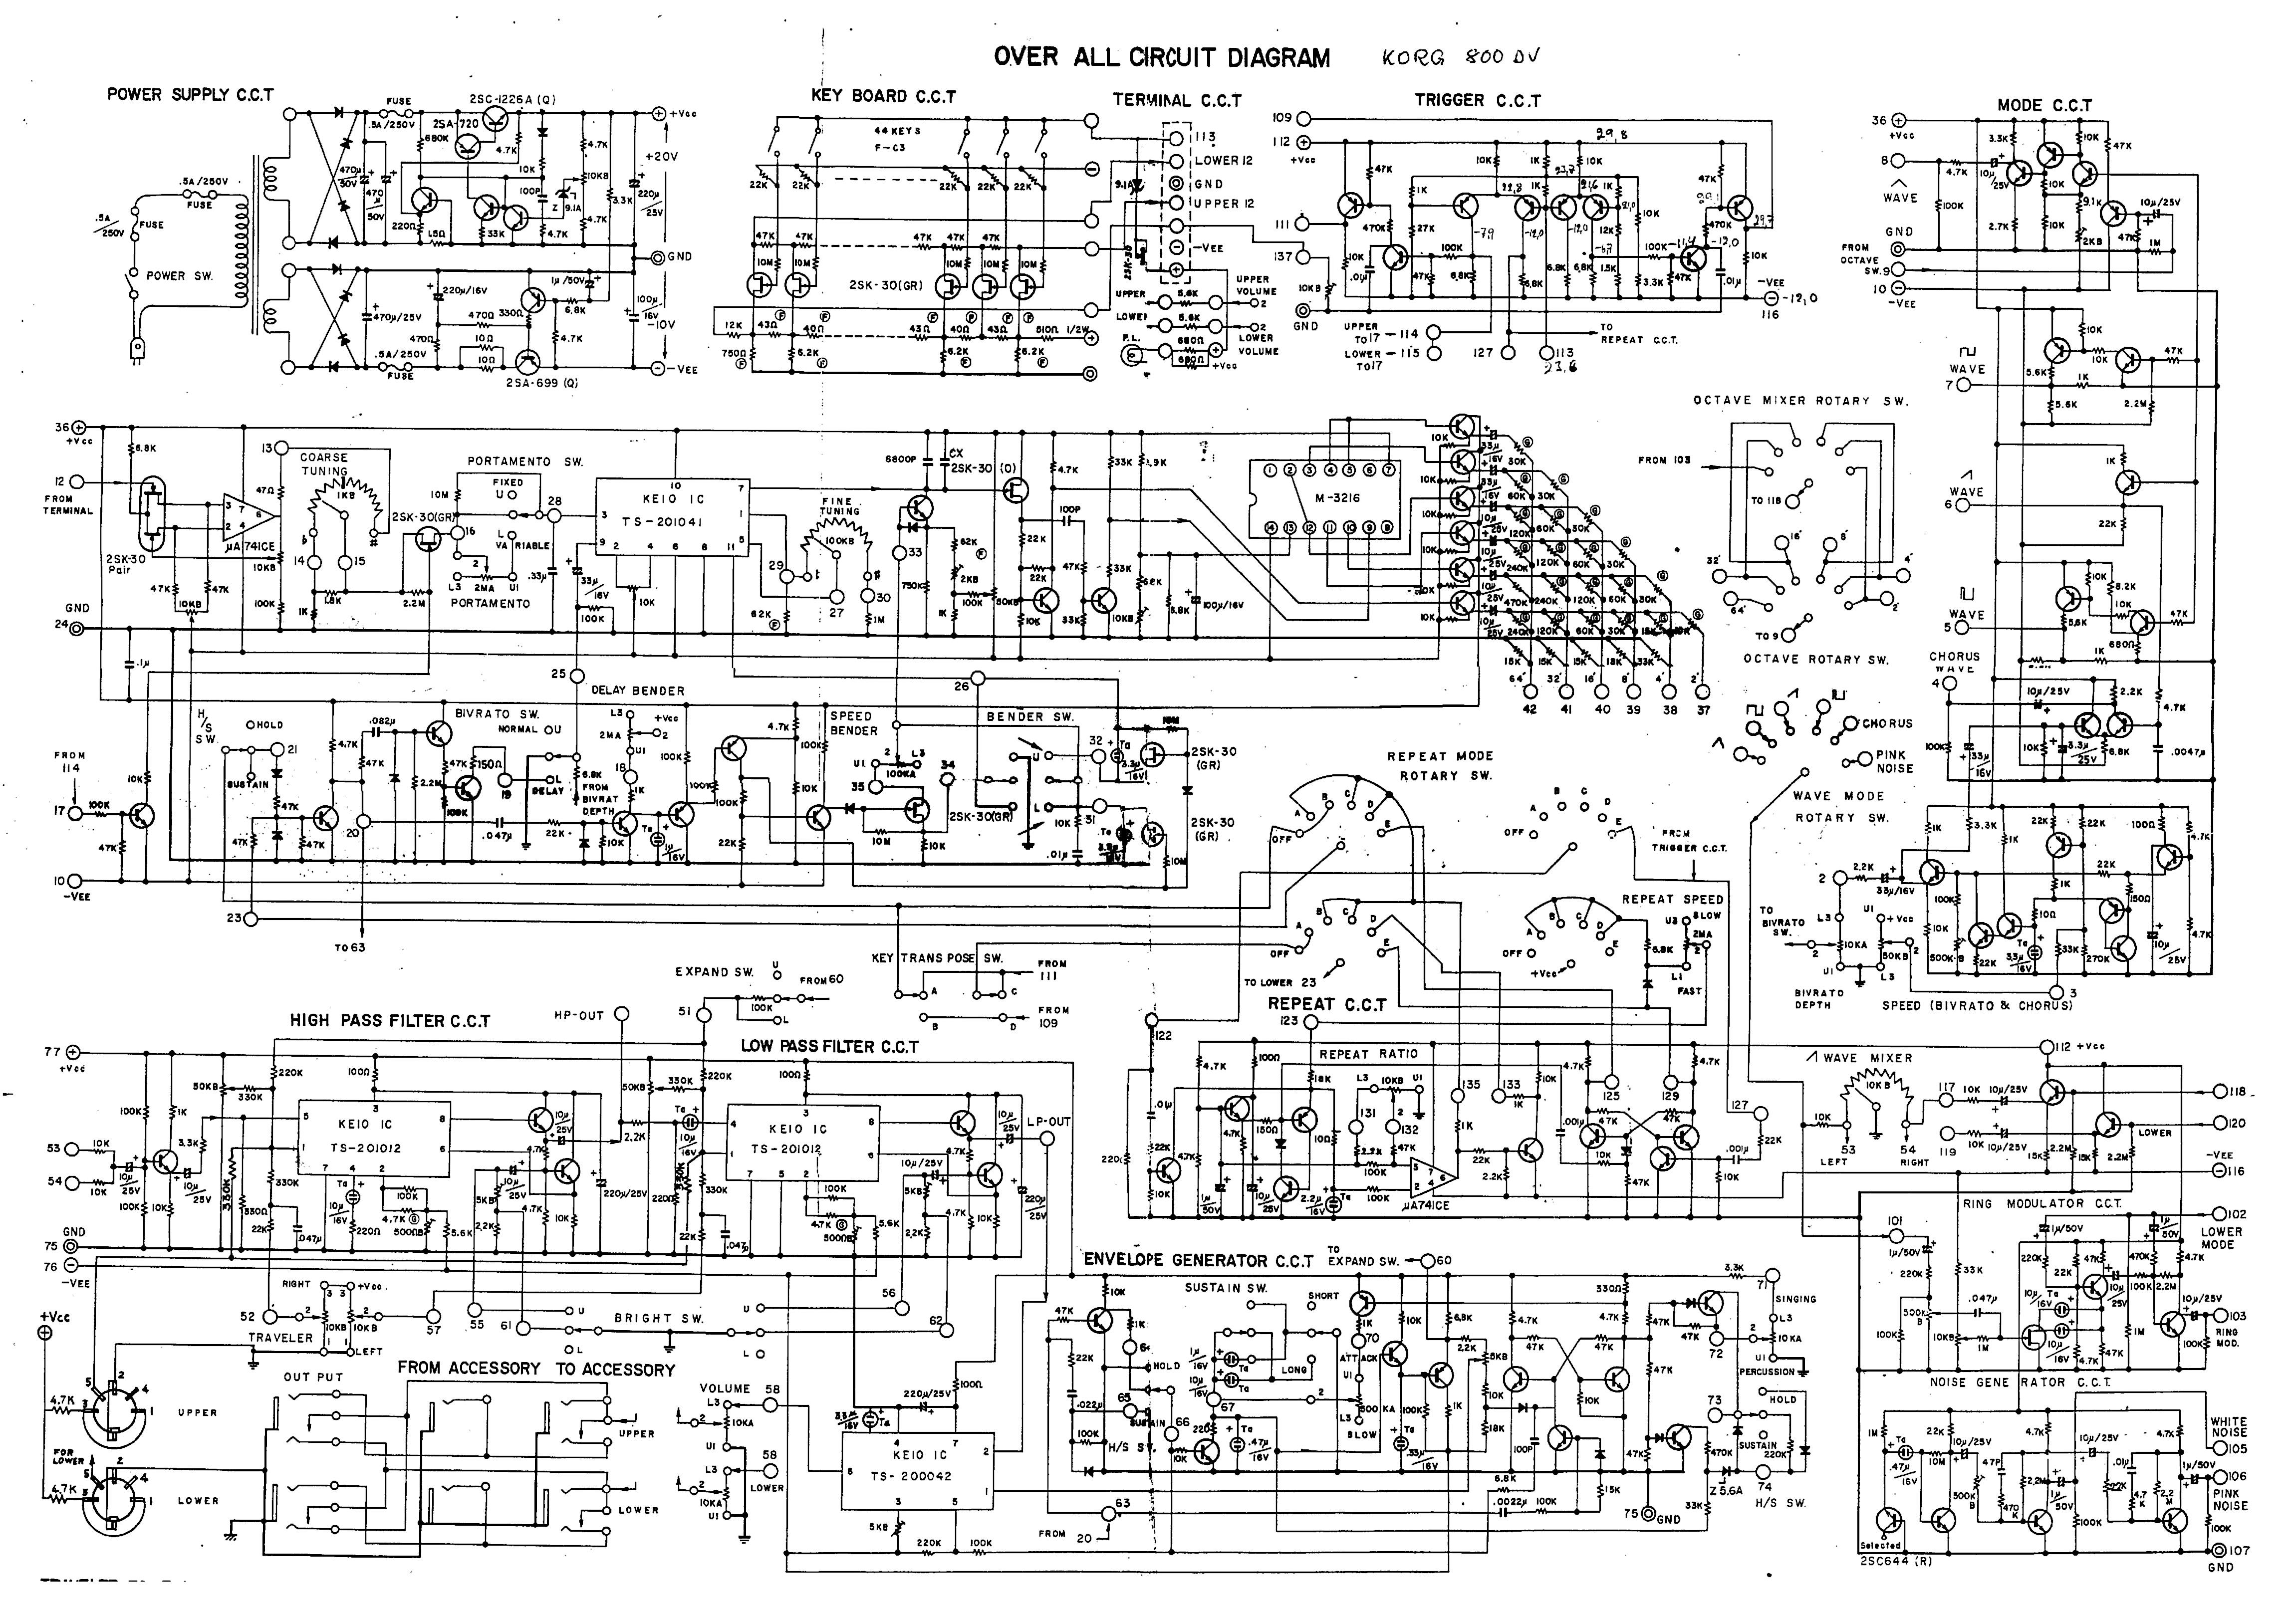 [FPER_4992]  ZL_2590] Prophet Wiring Diagram Download Diagram | Prophet Wiring Diagram |  | Hutpa Barba Hroni Barba Intel Meric Cajos Alia Ogeno Licuk Oidei Trons  Mohammedshrine Librar Wiring 101